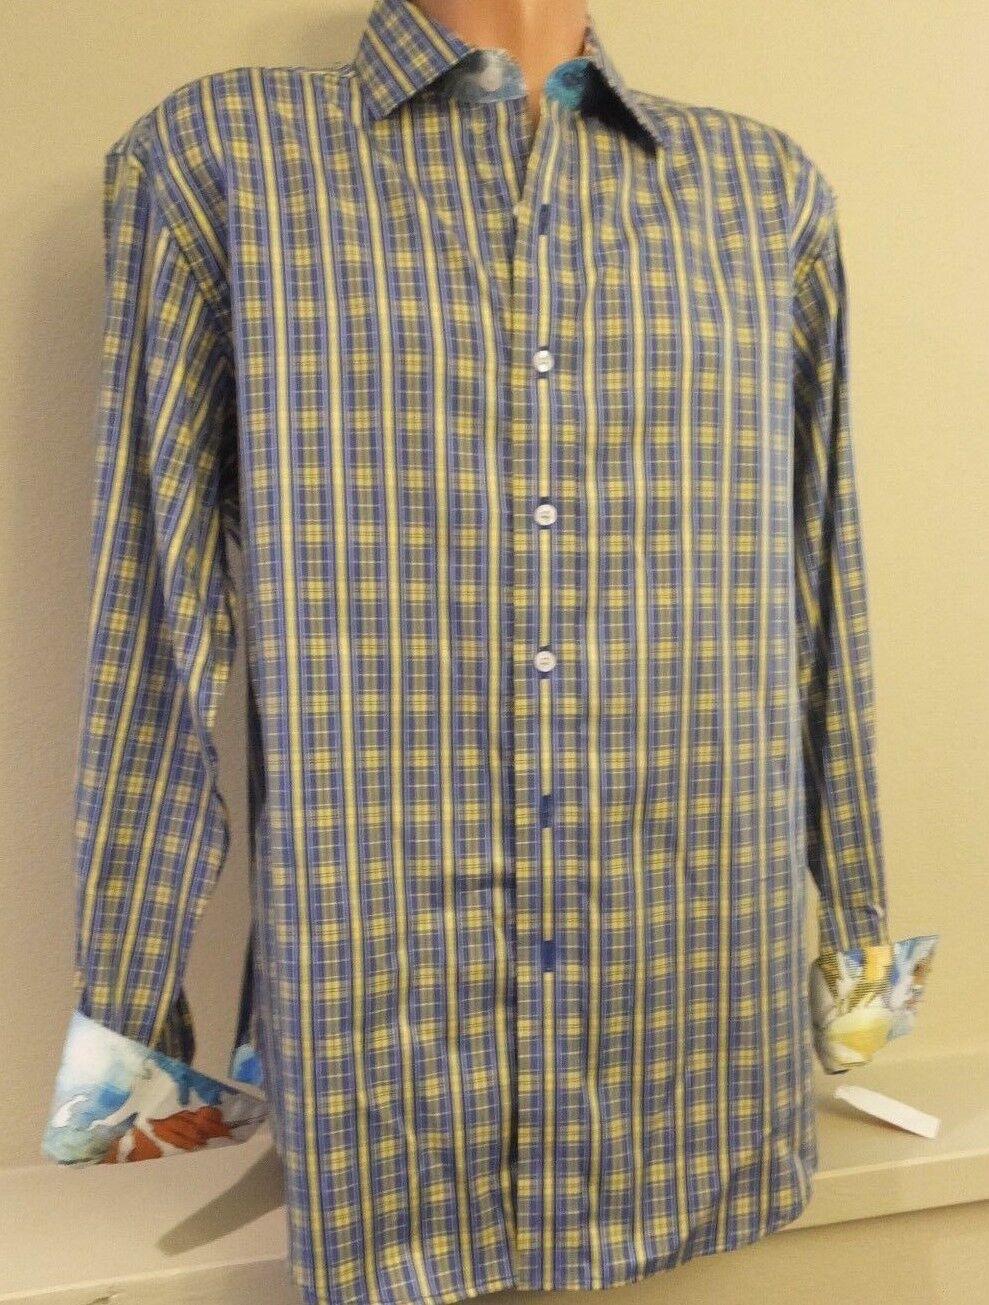 Mens L Robert Graham bluee Yellow Plaid Button Front Shirt Long Sleeve MALONE